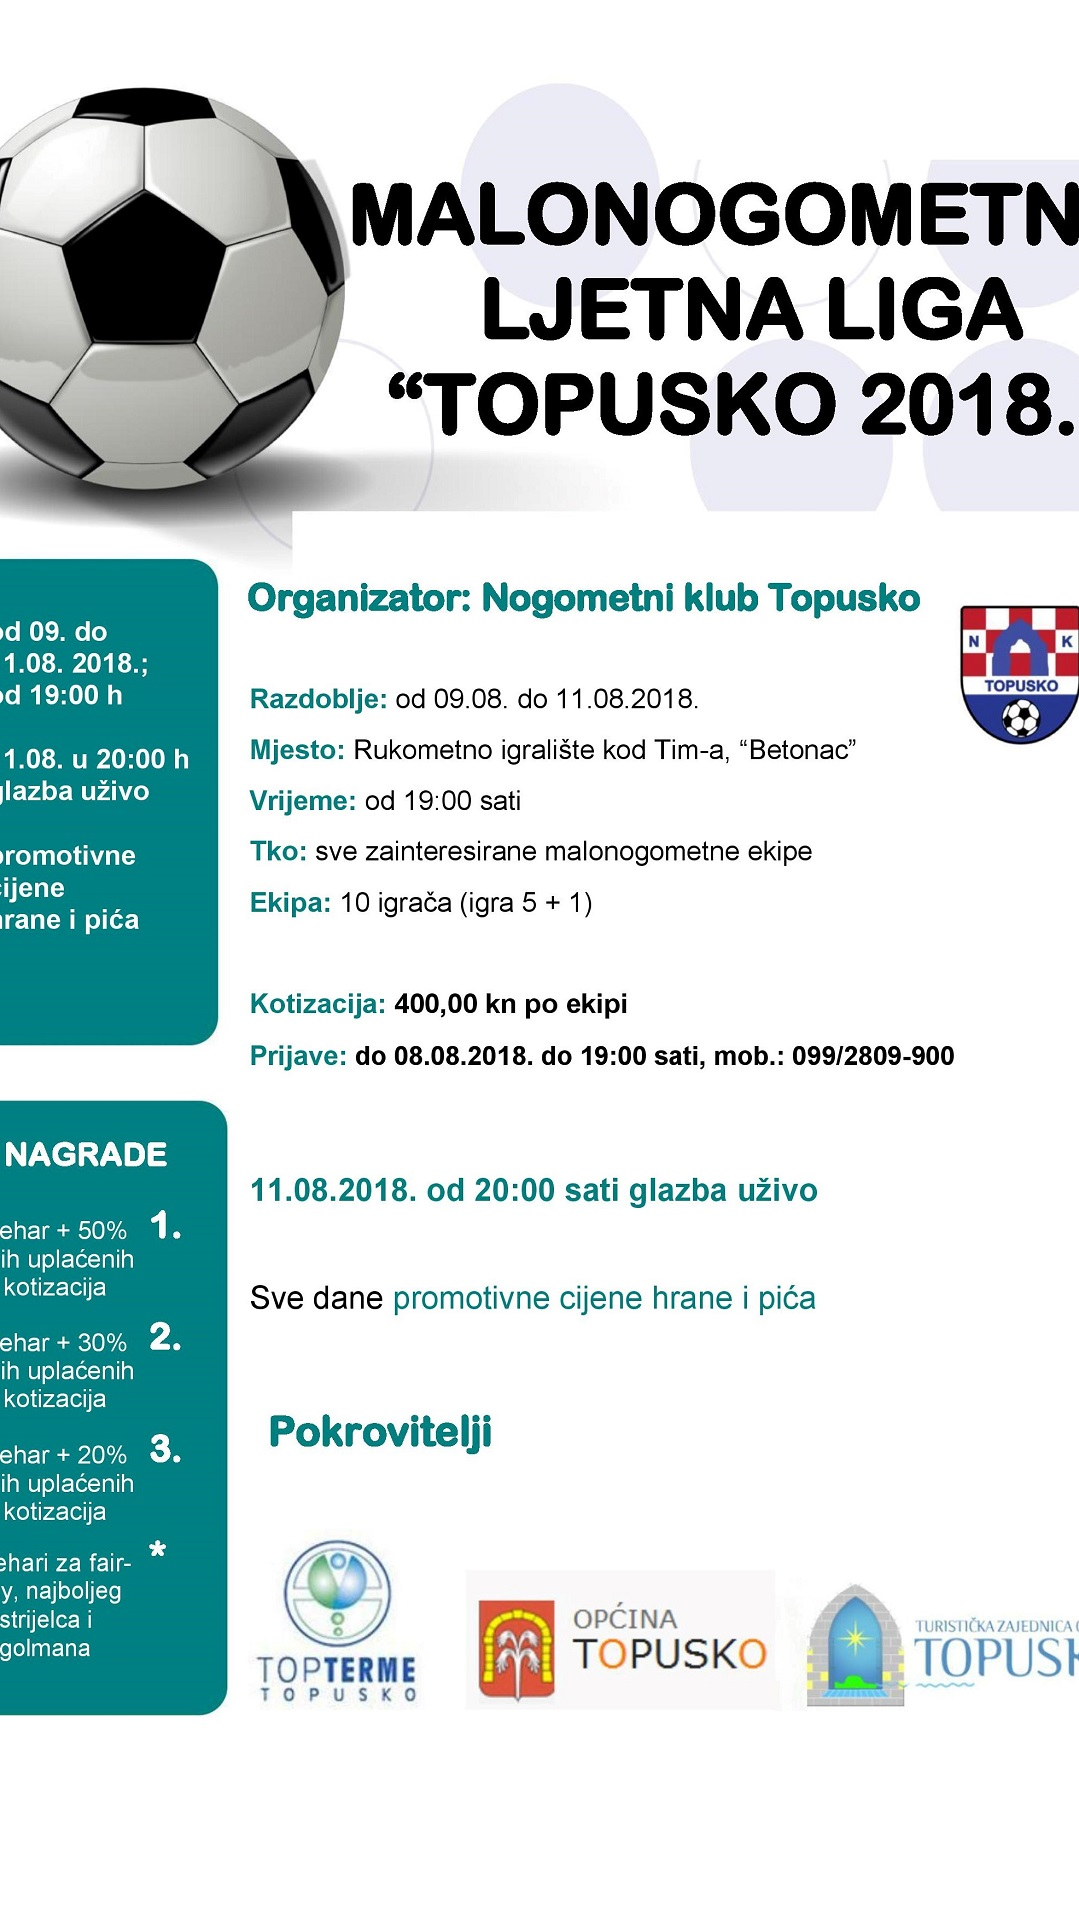 "Malonogometna ljetna liga ""Topusko 2018."" 9.-11.8.2018."